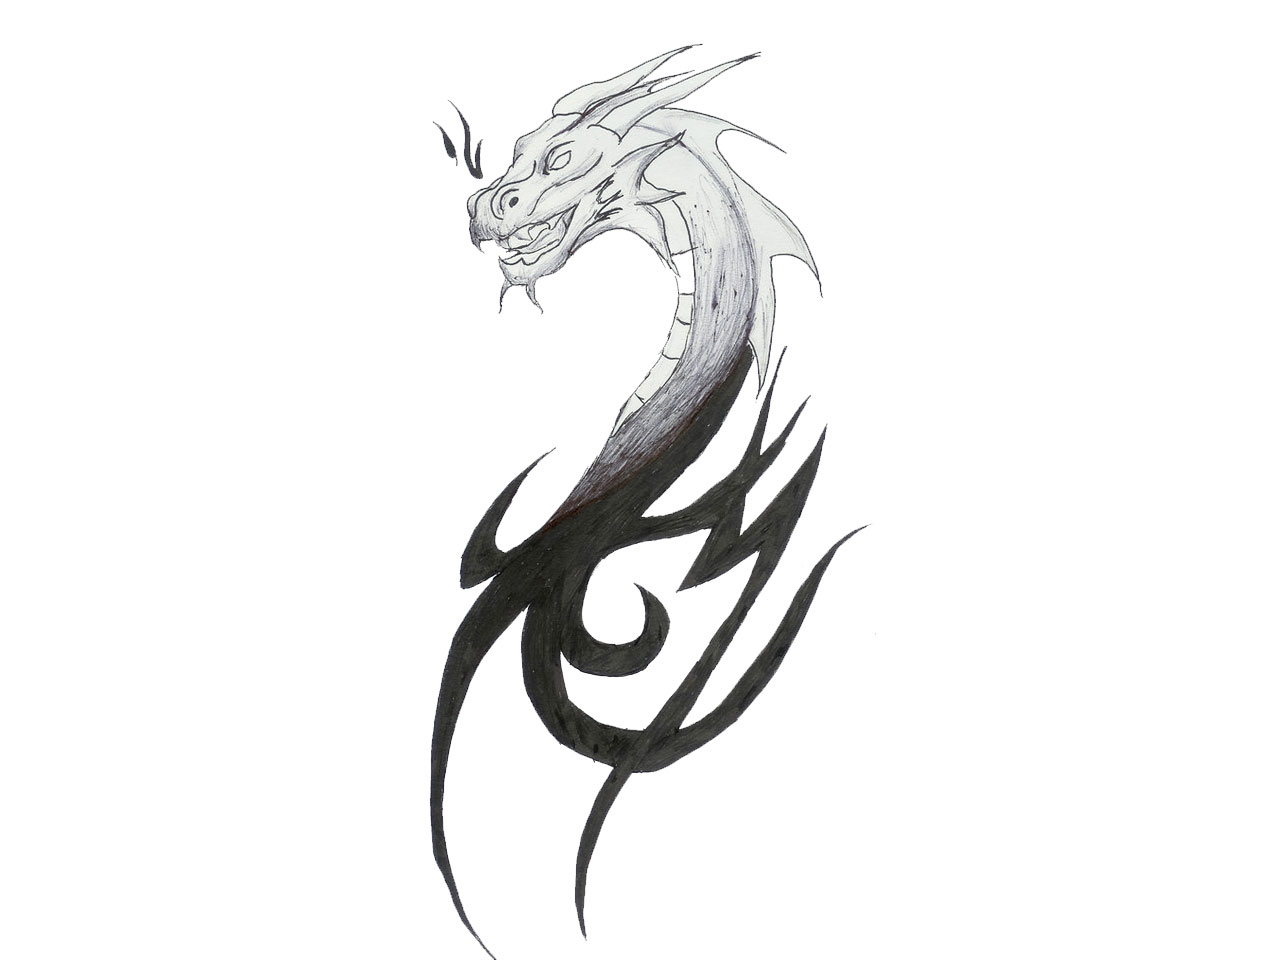 Tattoo Dragon Head Sketches free image